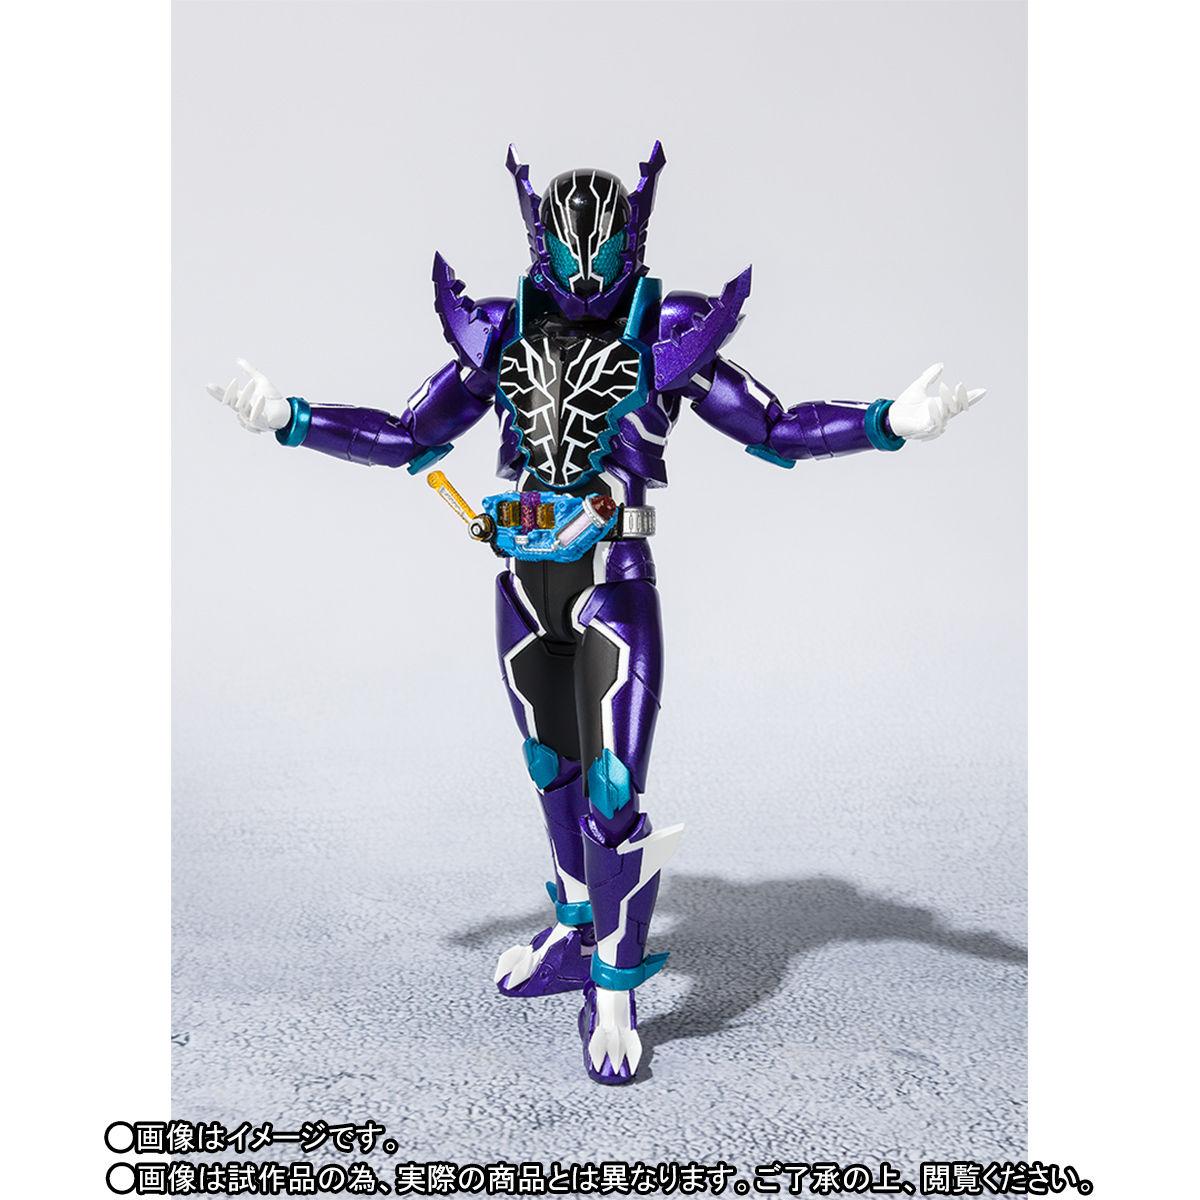 S.H.フィギュアーツ『仮面ライダーローグ』可動フィギュア-006